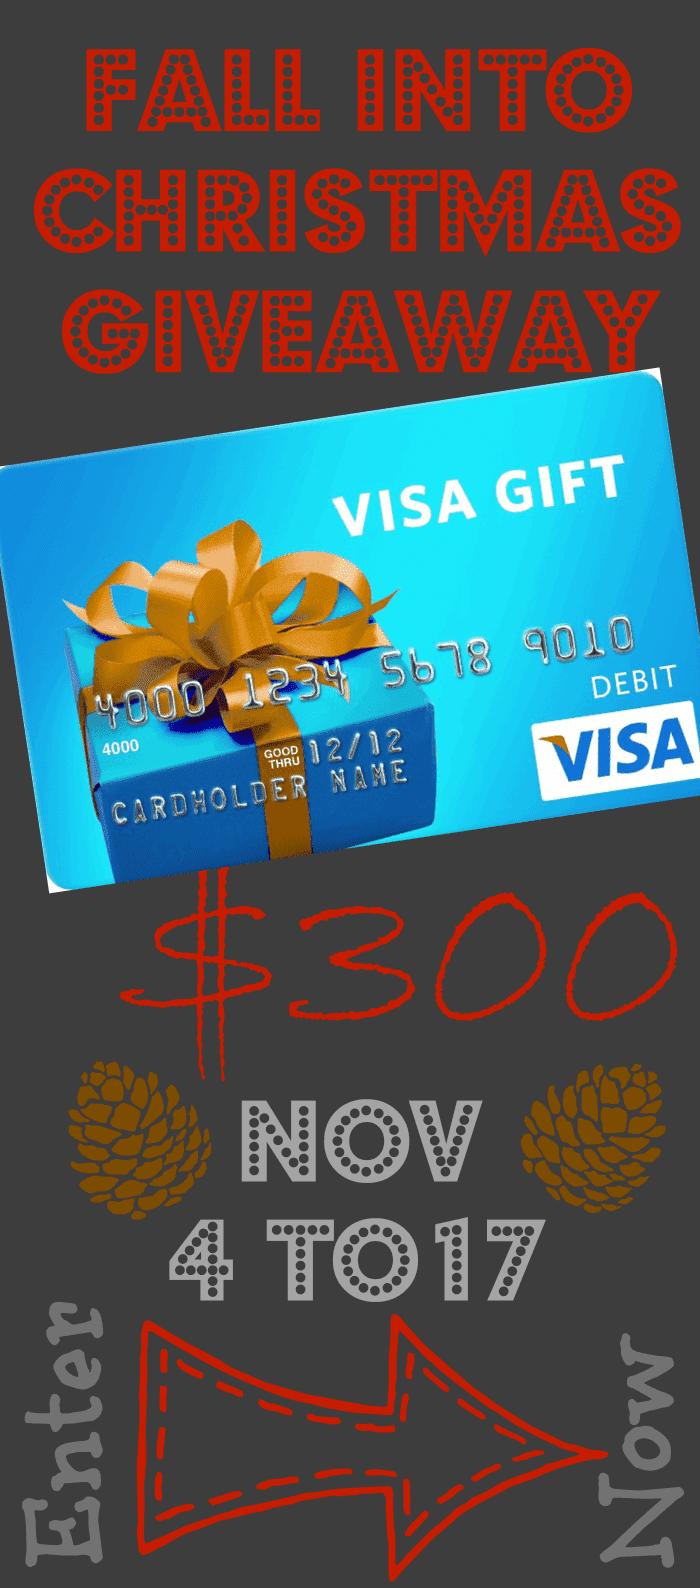 Fall Into Christmas $300 Visa Card Giveaway!